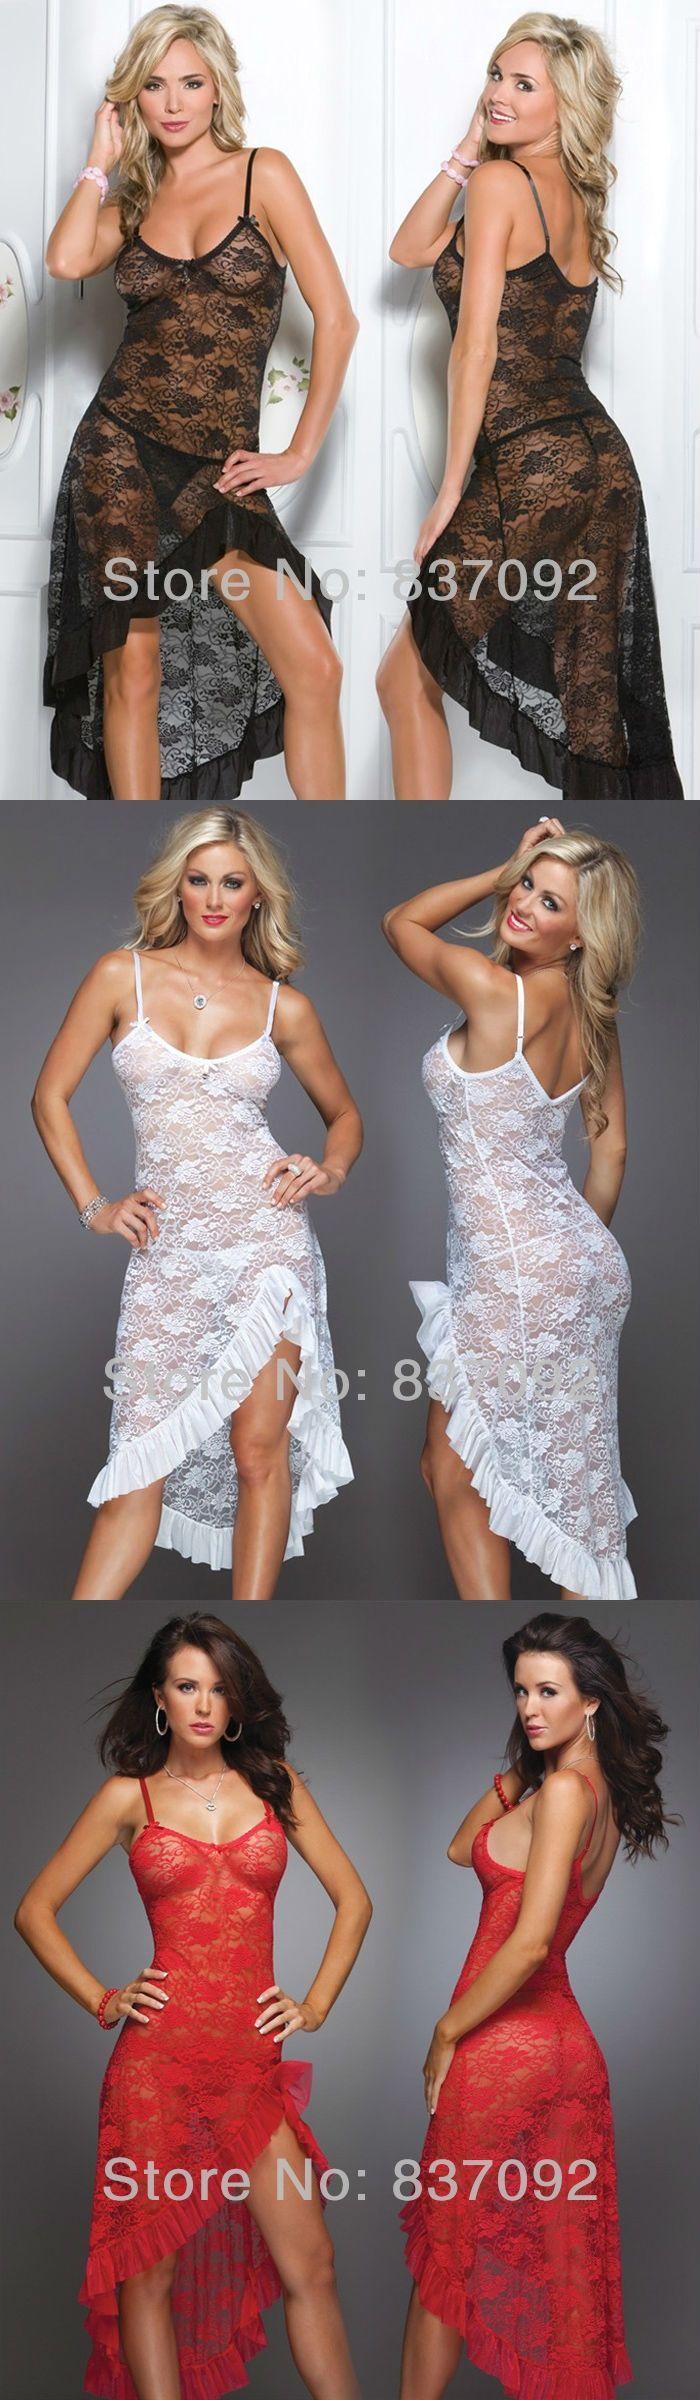 Black White Red Plus Size S M L XL XXL 2XL 3XL 4XL Lingerie Nightgown Gown Long Lace Babydoll Chemise Sleepwear  -7112